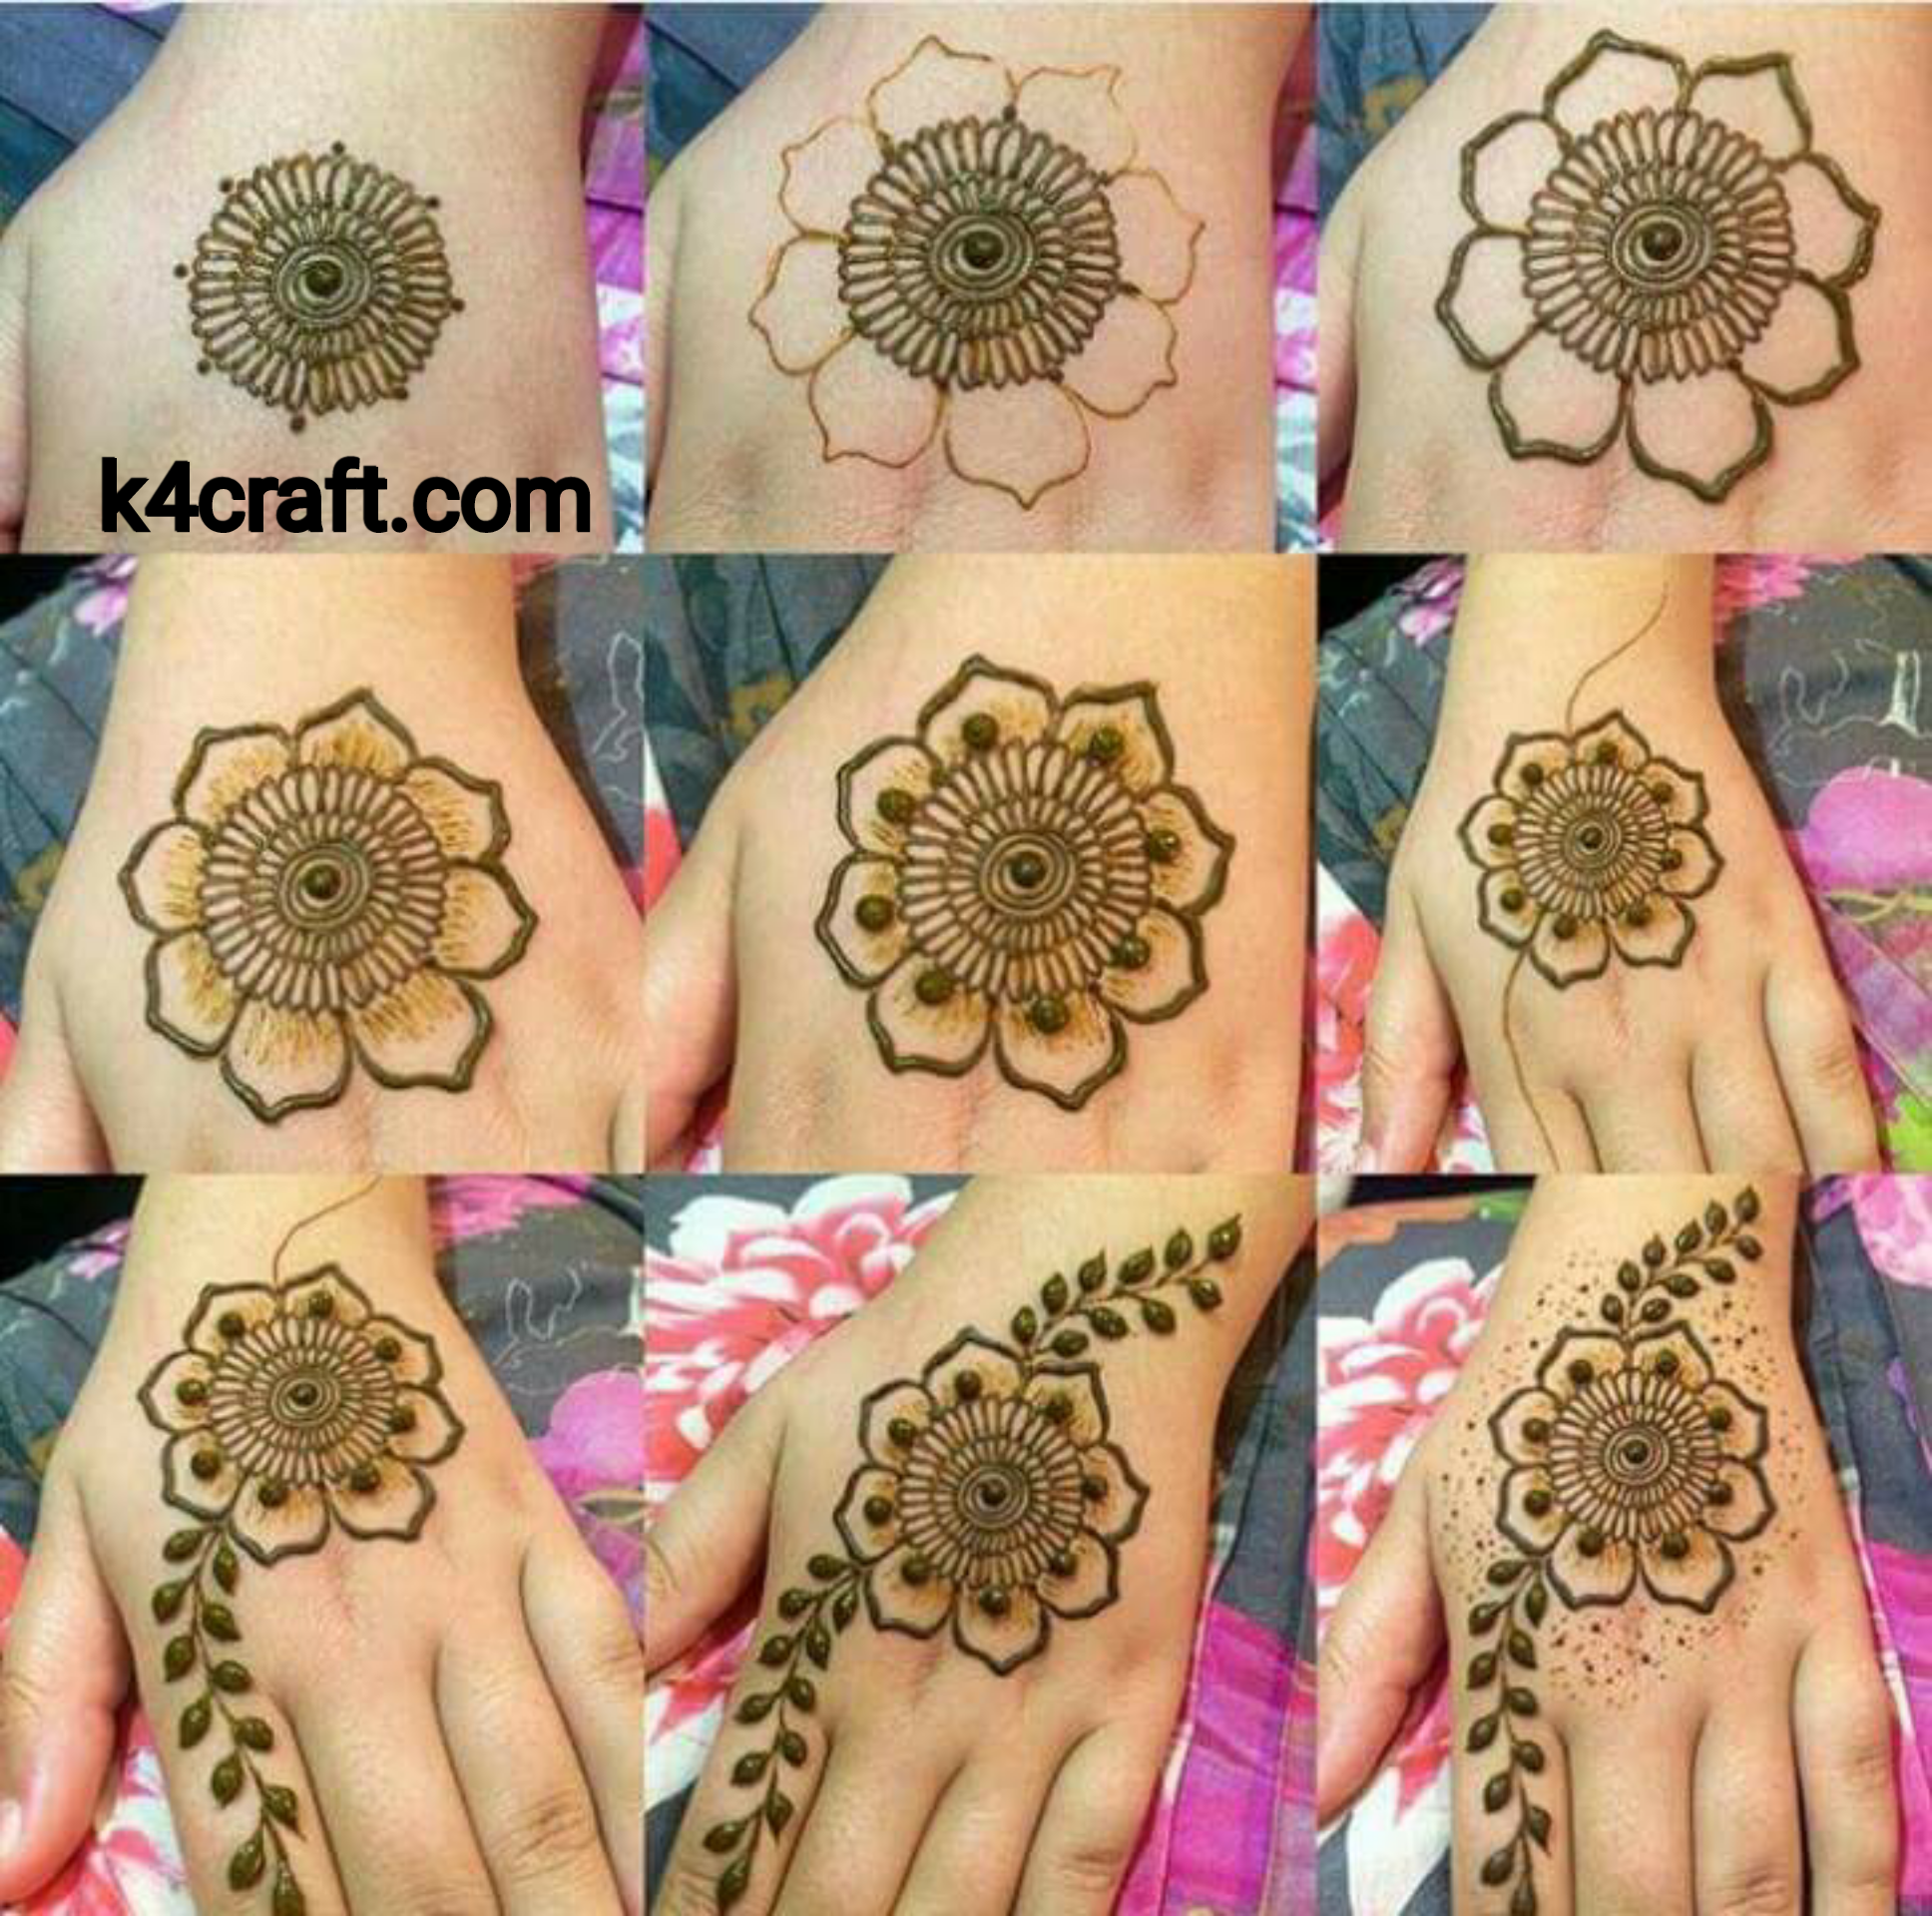 Simple Arabic Mehndi Design Step By Step Step By Step Ideas In 2020 Mehndi Designs For Fingers Mehndi Designs For Hands Mehndi Designs,Tribal Upper Arm Half Sleeve Tattoo Designs